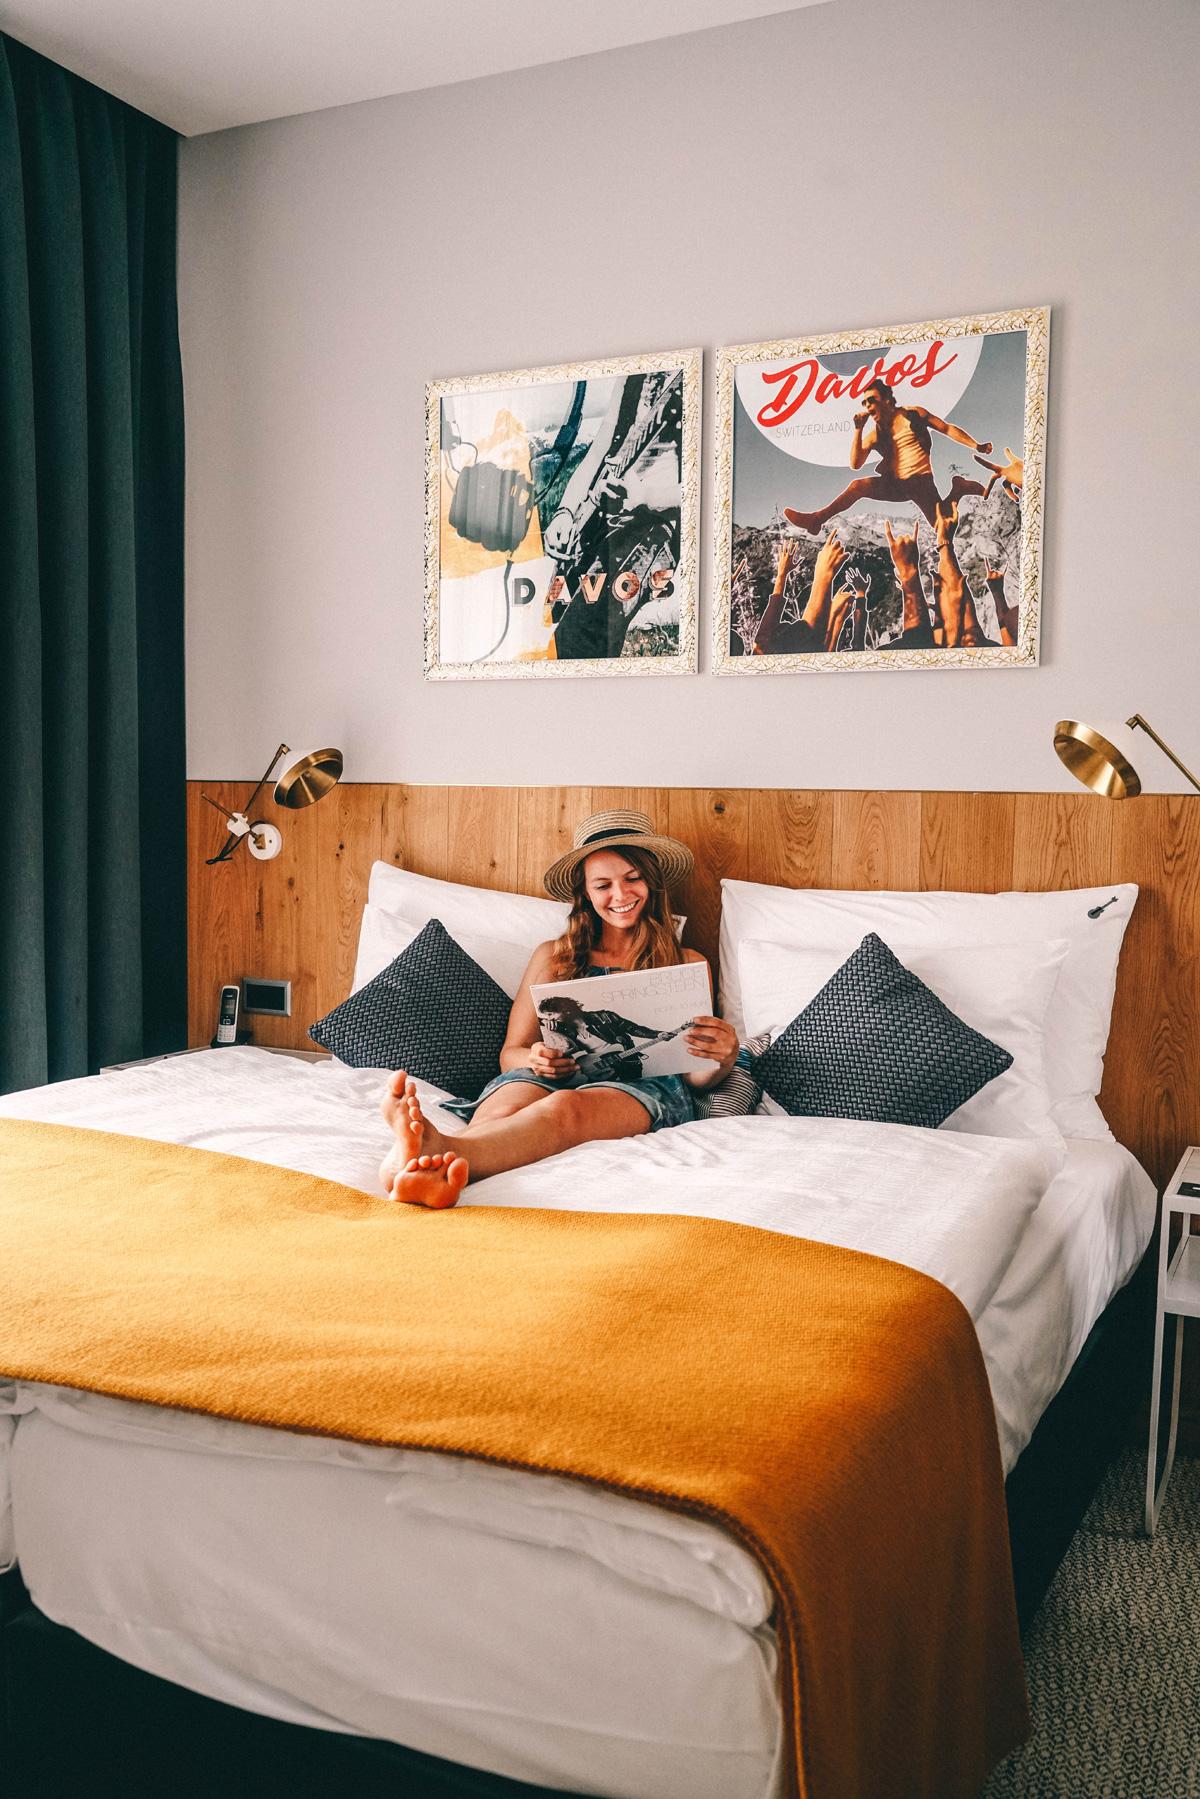 Hard-Rock-Hotel-Davos-Christine-Neder